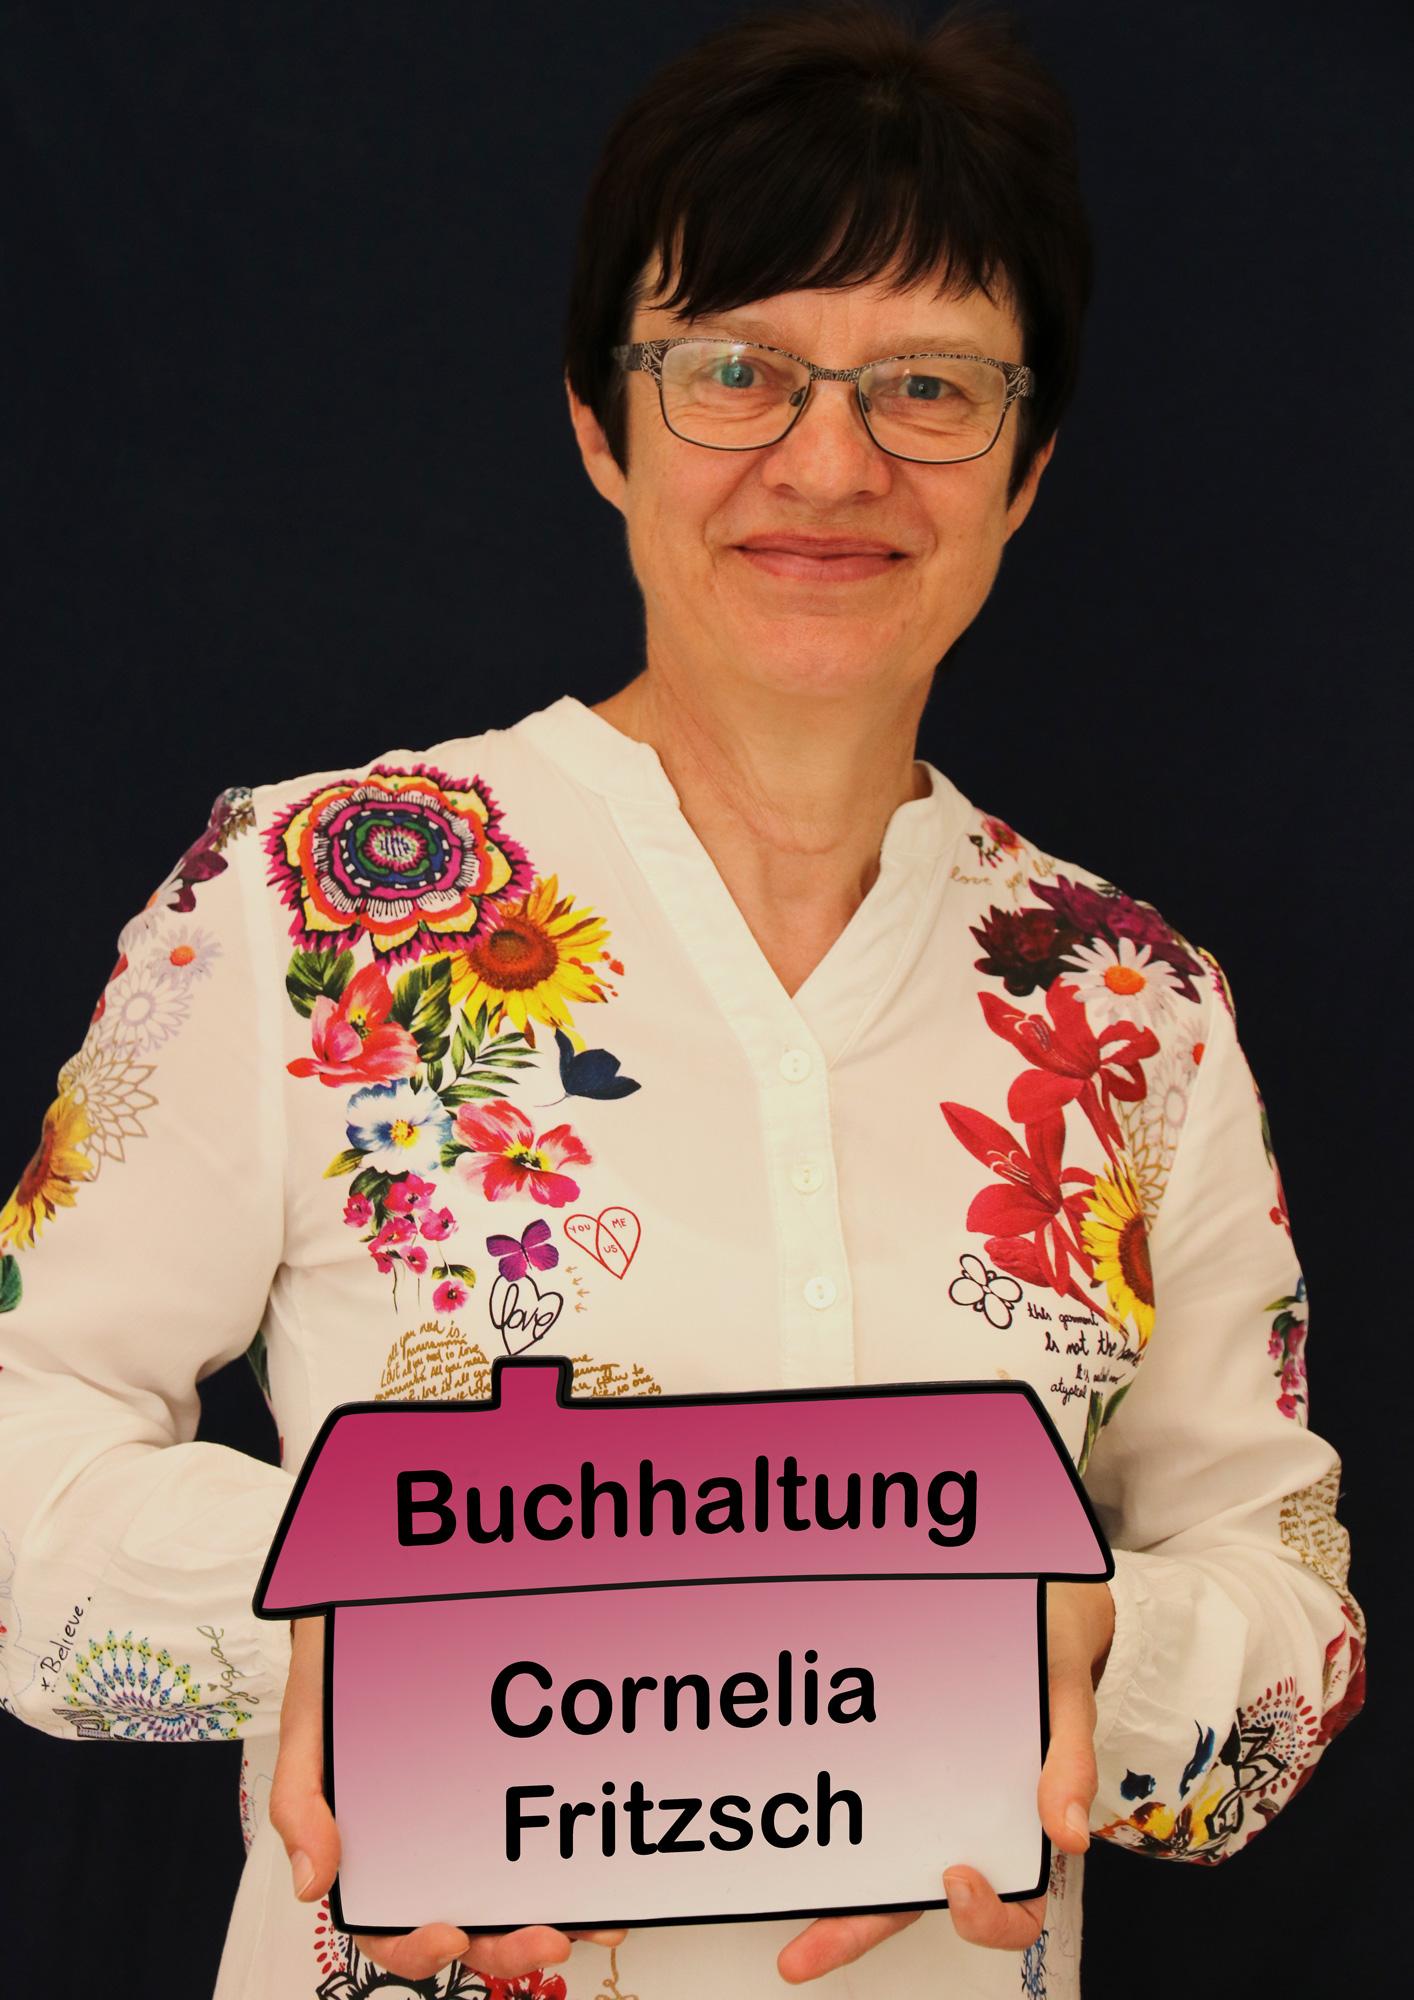 Cornelia Fritzsch